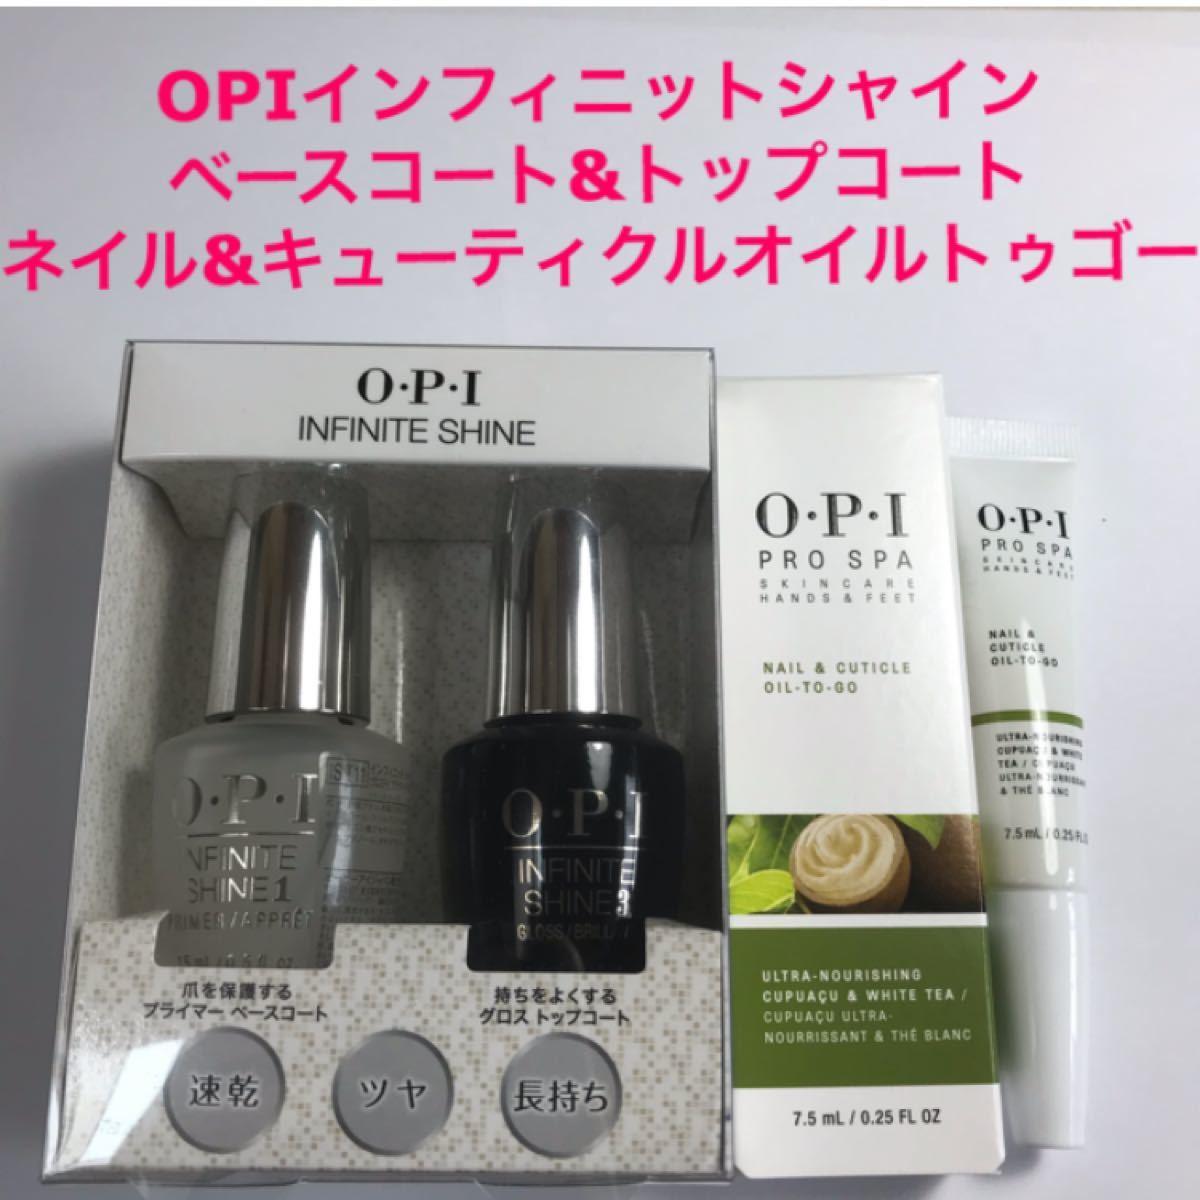 OPIインフィニットシャイン ベースコート&トップコート・プロスパネイルアンドキューティクルオイルトゥゴー 新品未使用未開封